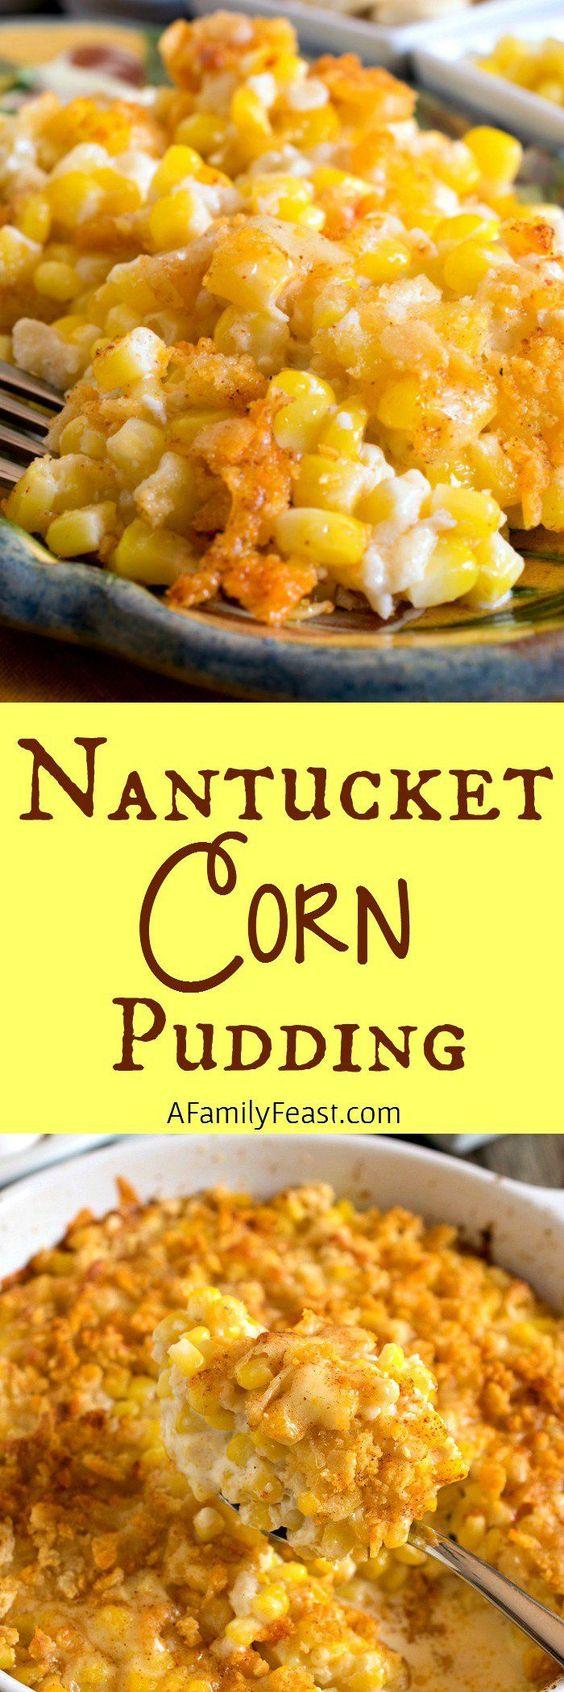 Nantucket Corn Pudding.